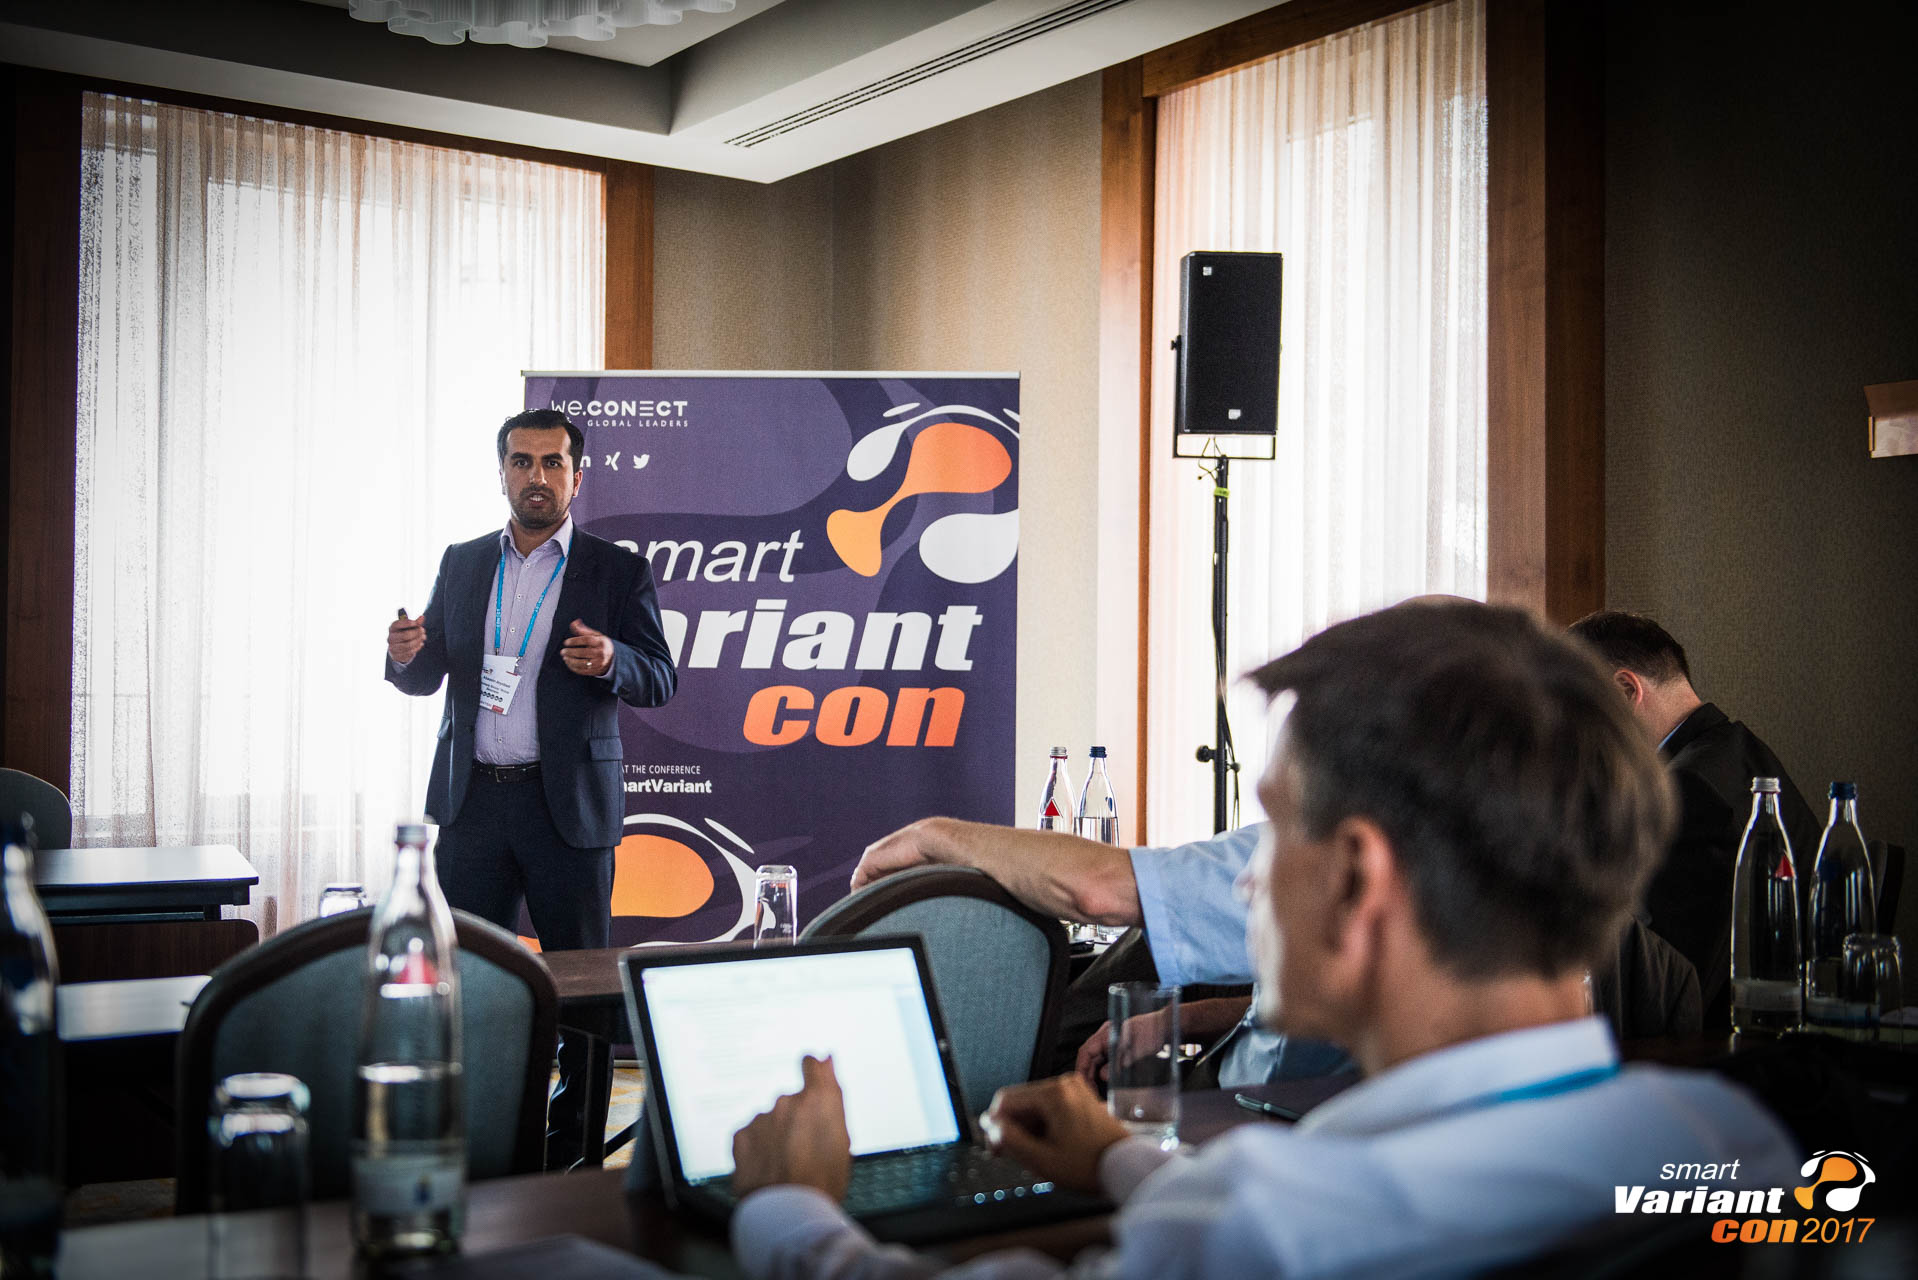 Smart Variant 2017-47